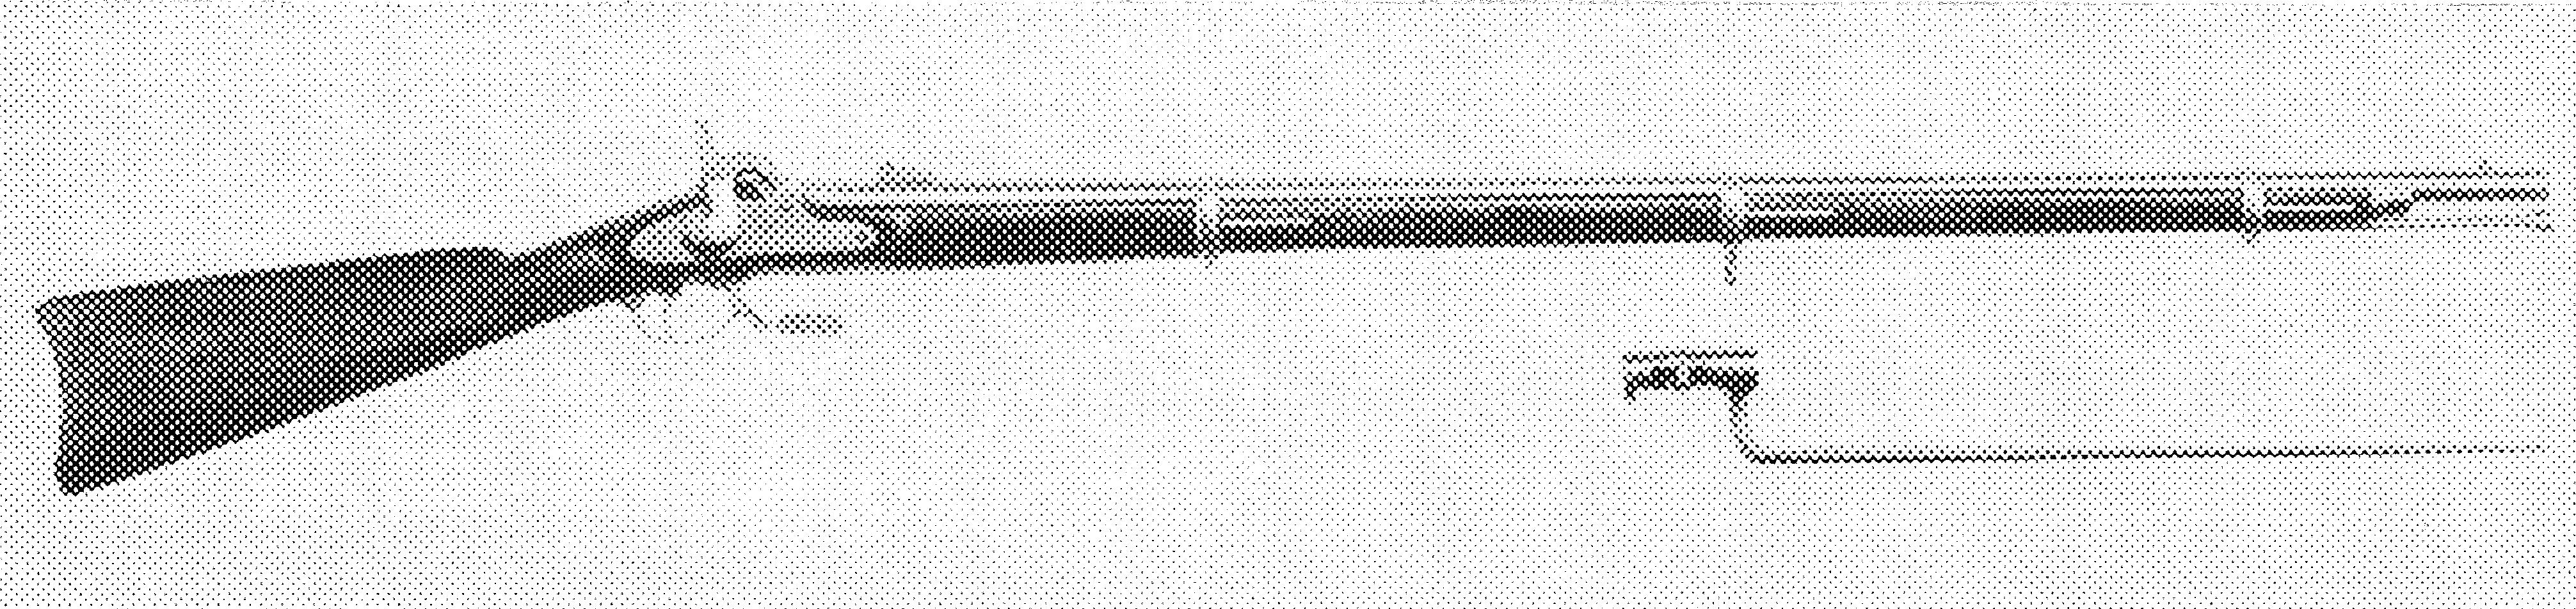 Model 1861 Single-Shot Rifled Musket